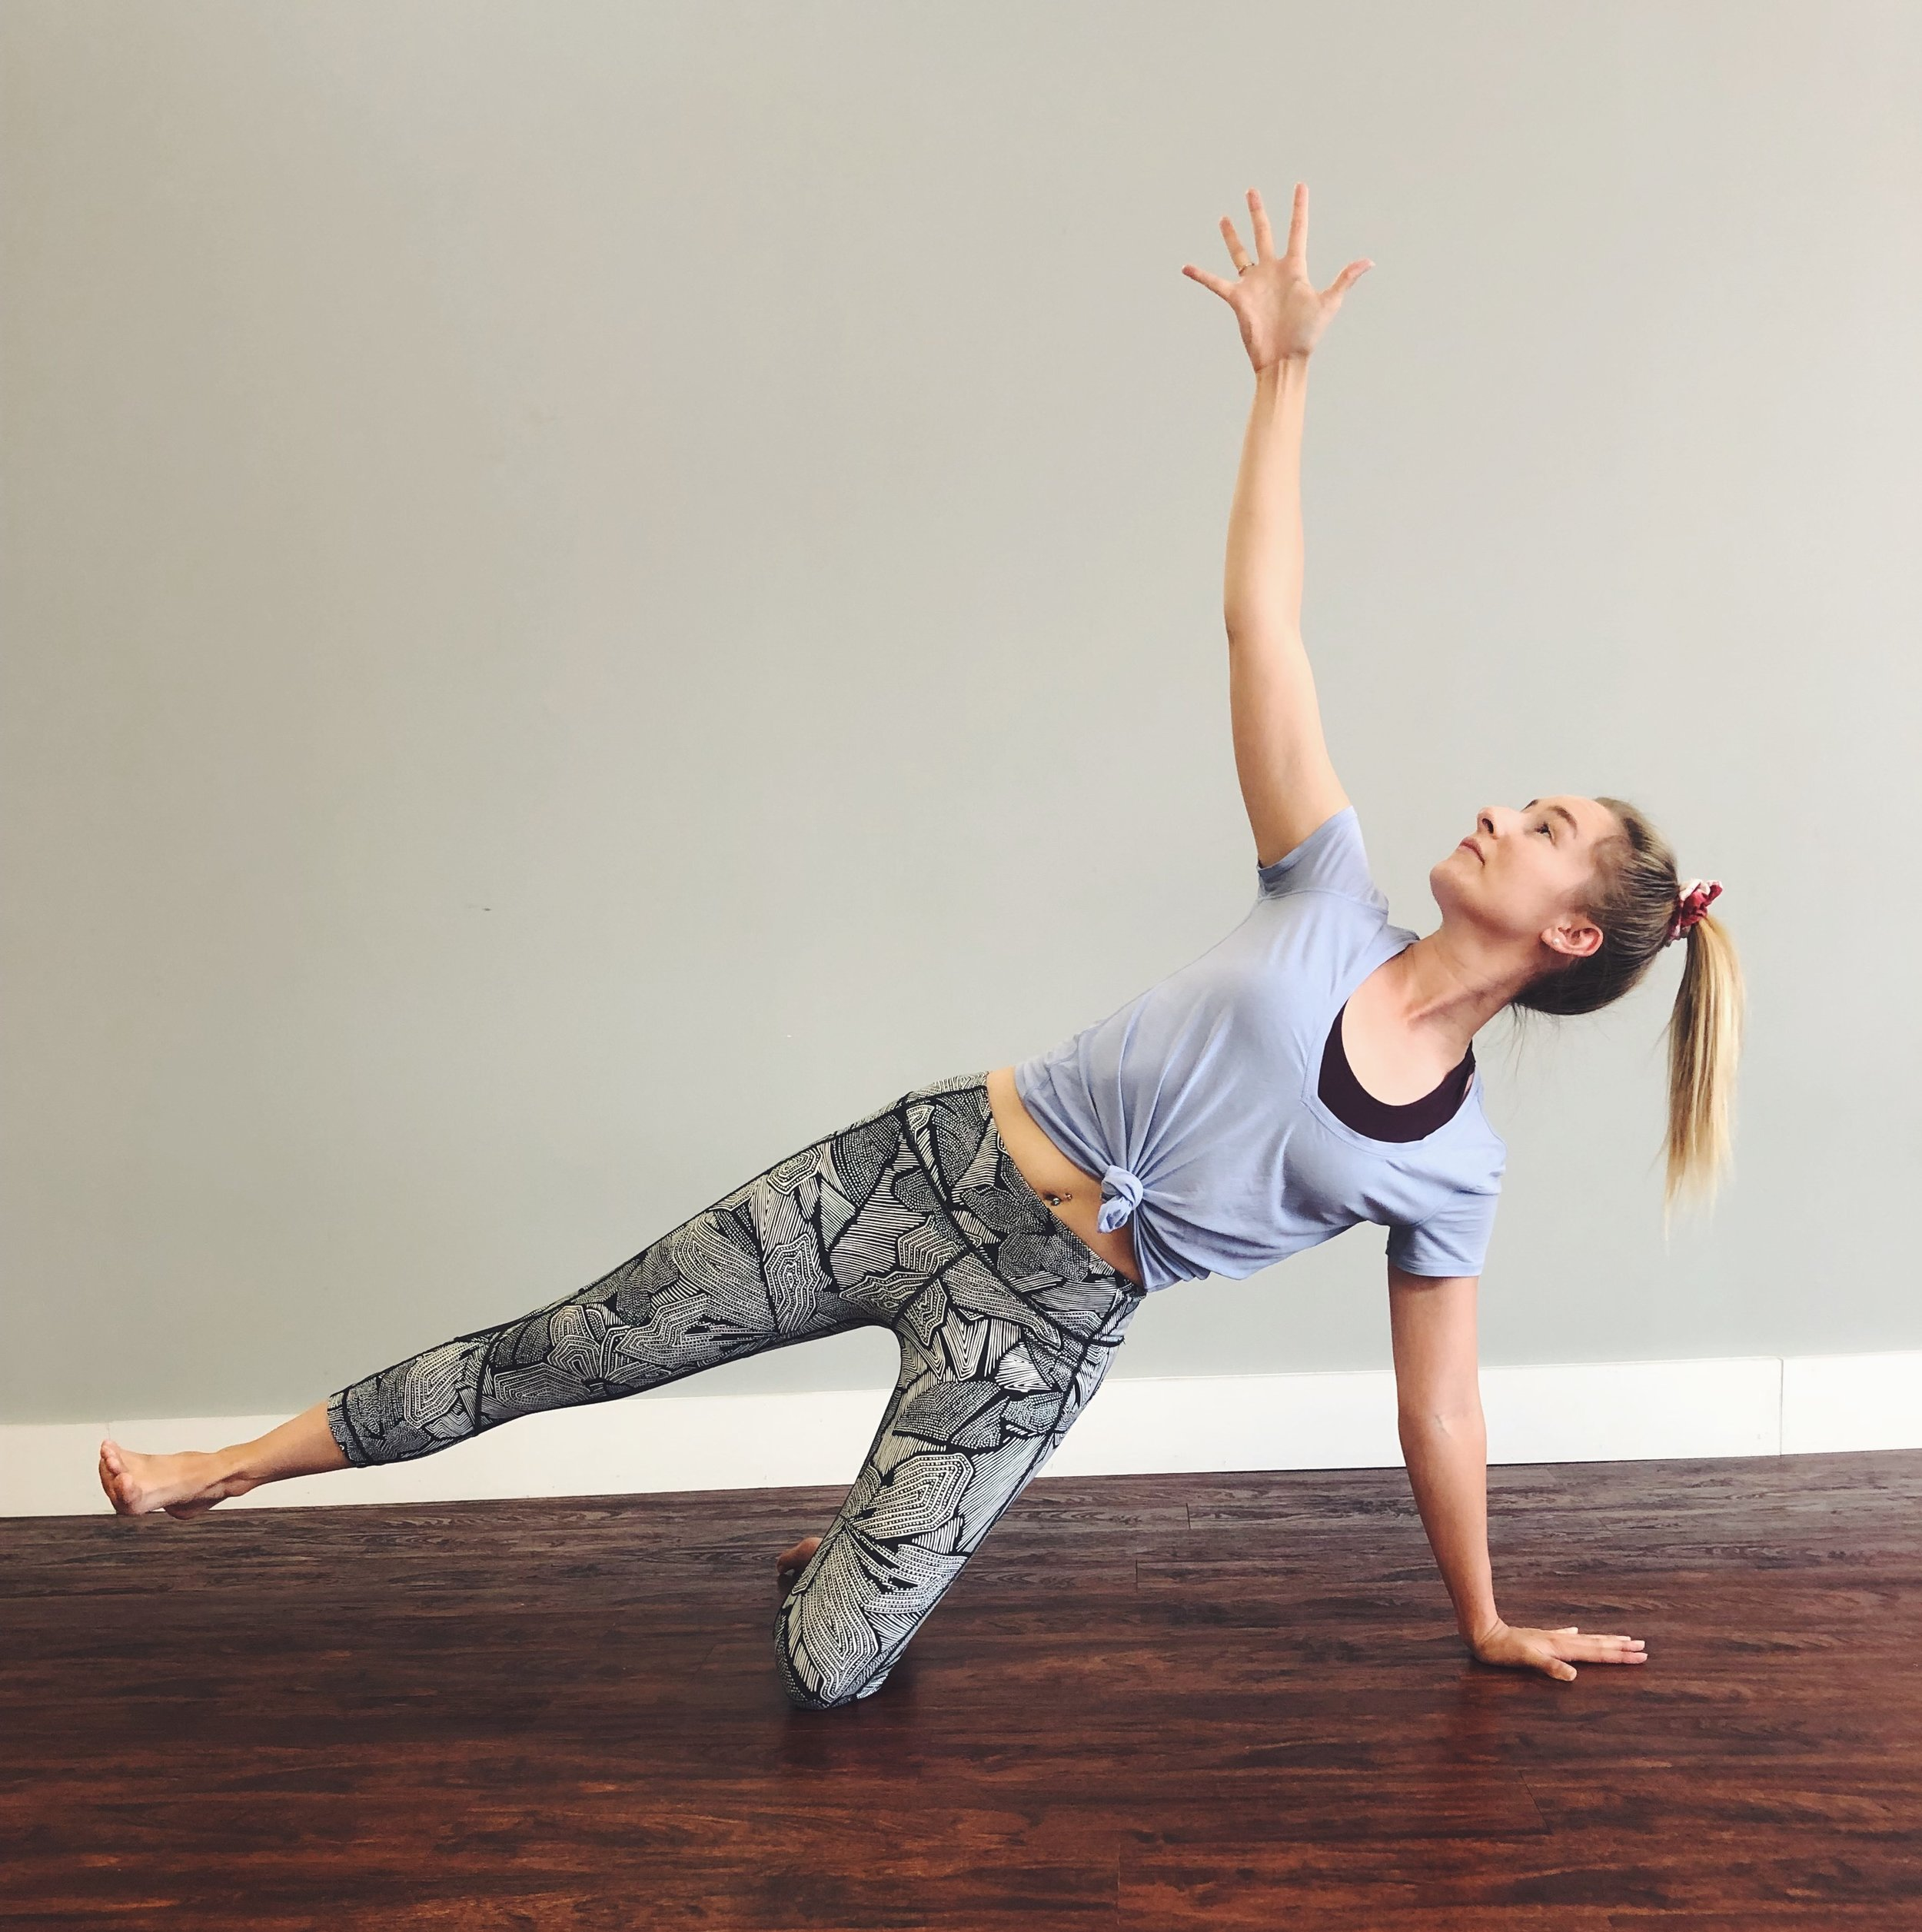 meagan-santa-hamilton-yoga-cross-training